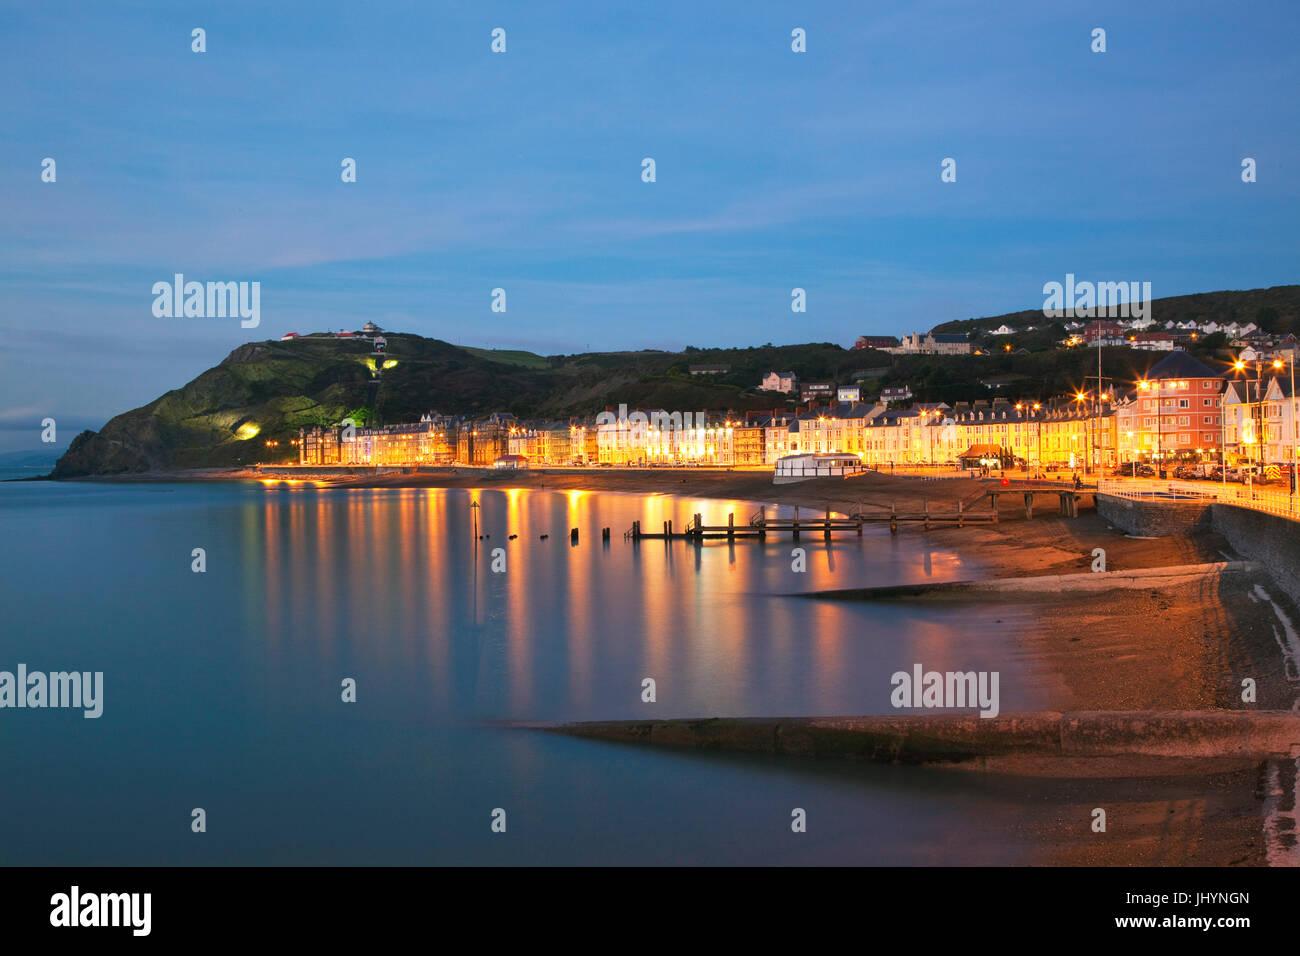 Aberystwyth, Ceredigion, West Wales, United Kingdom, Europe Stock Photo